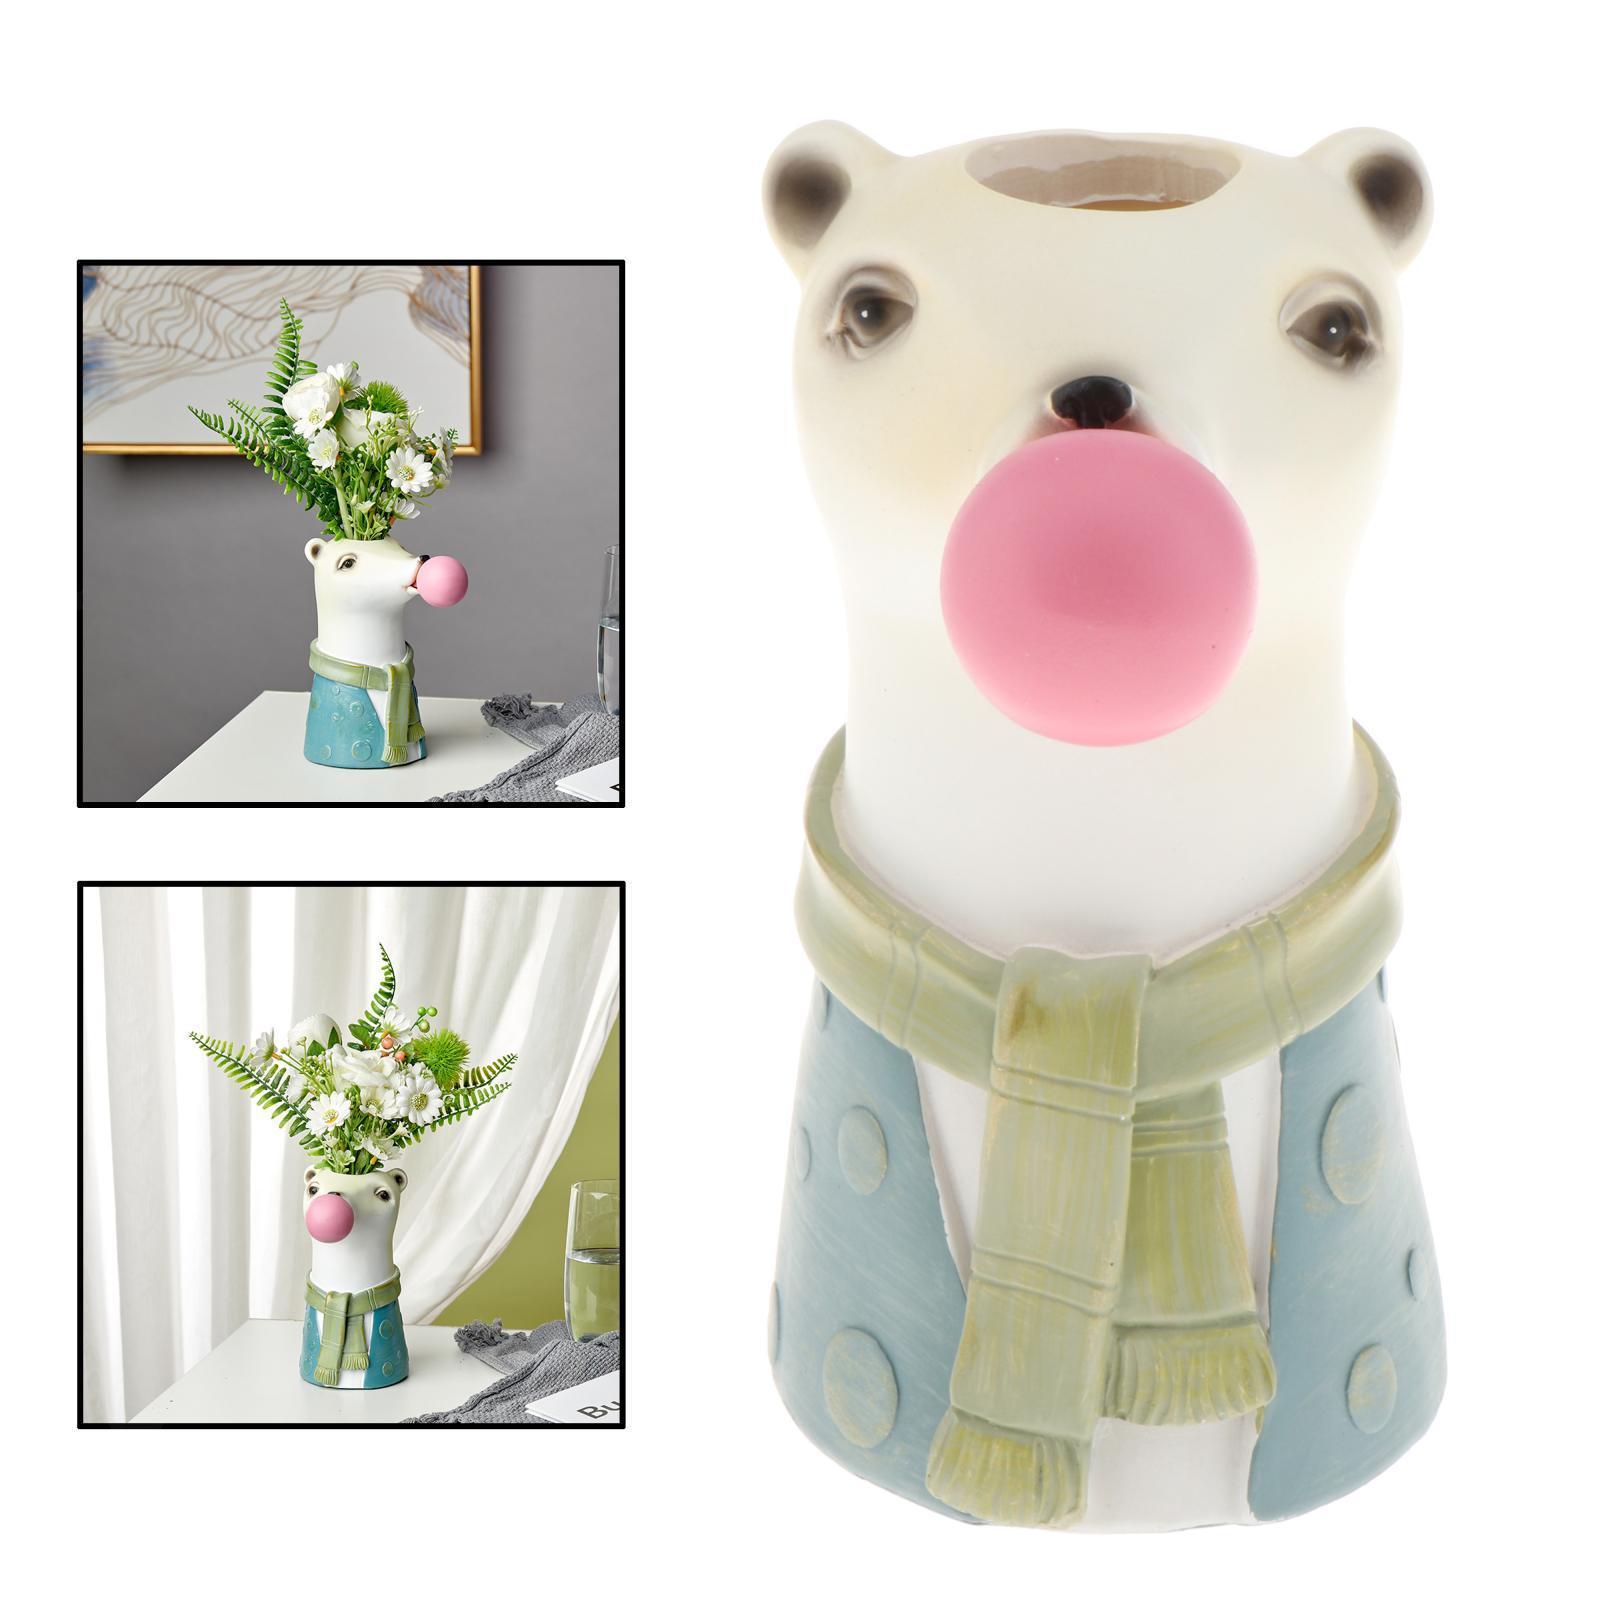 Indexbild 9 - Harz Tierkopf Trockenblume Vase Pflanzer Topf Home Office Bar Desktop Ornament